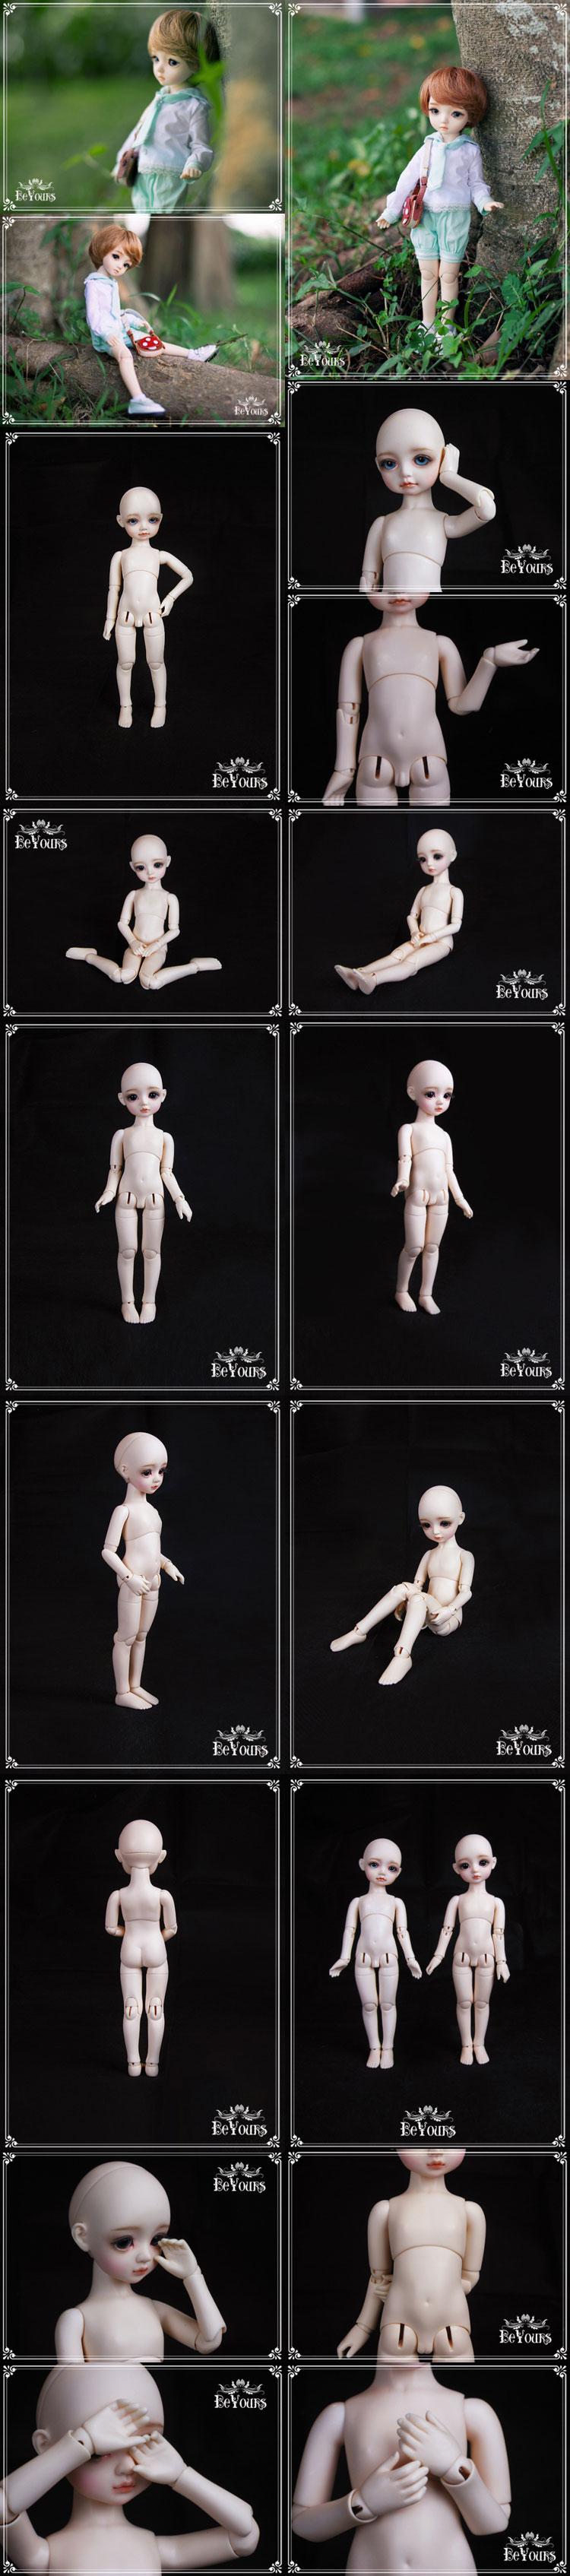 BJD Taro 27cm Ball Jointed Doll